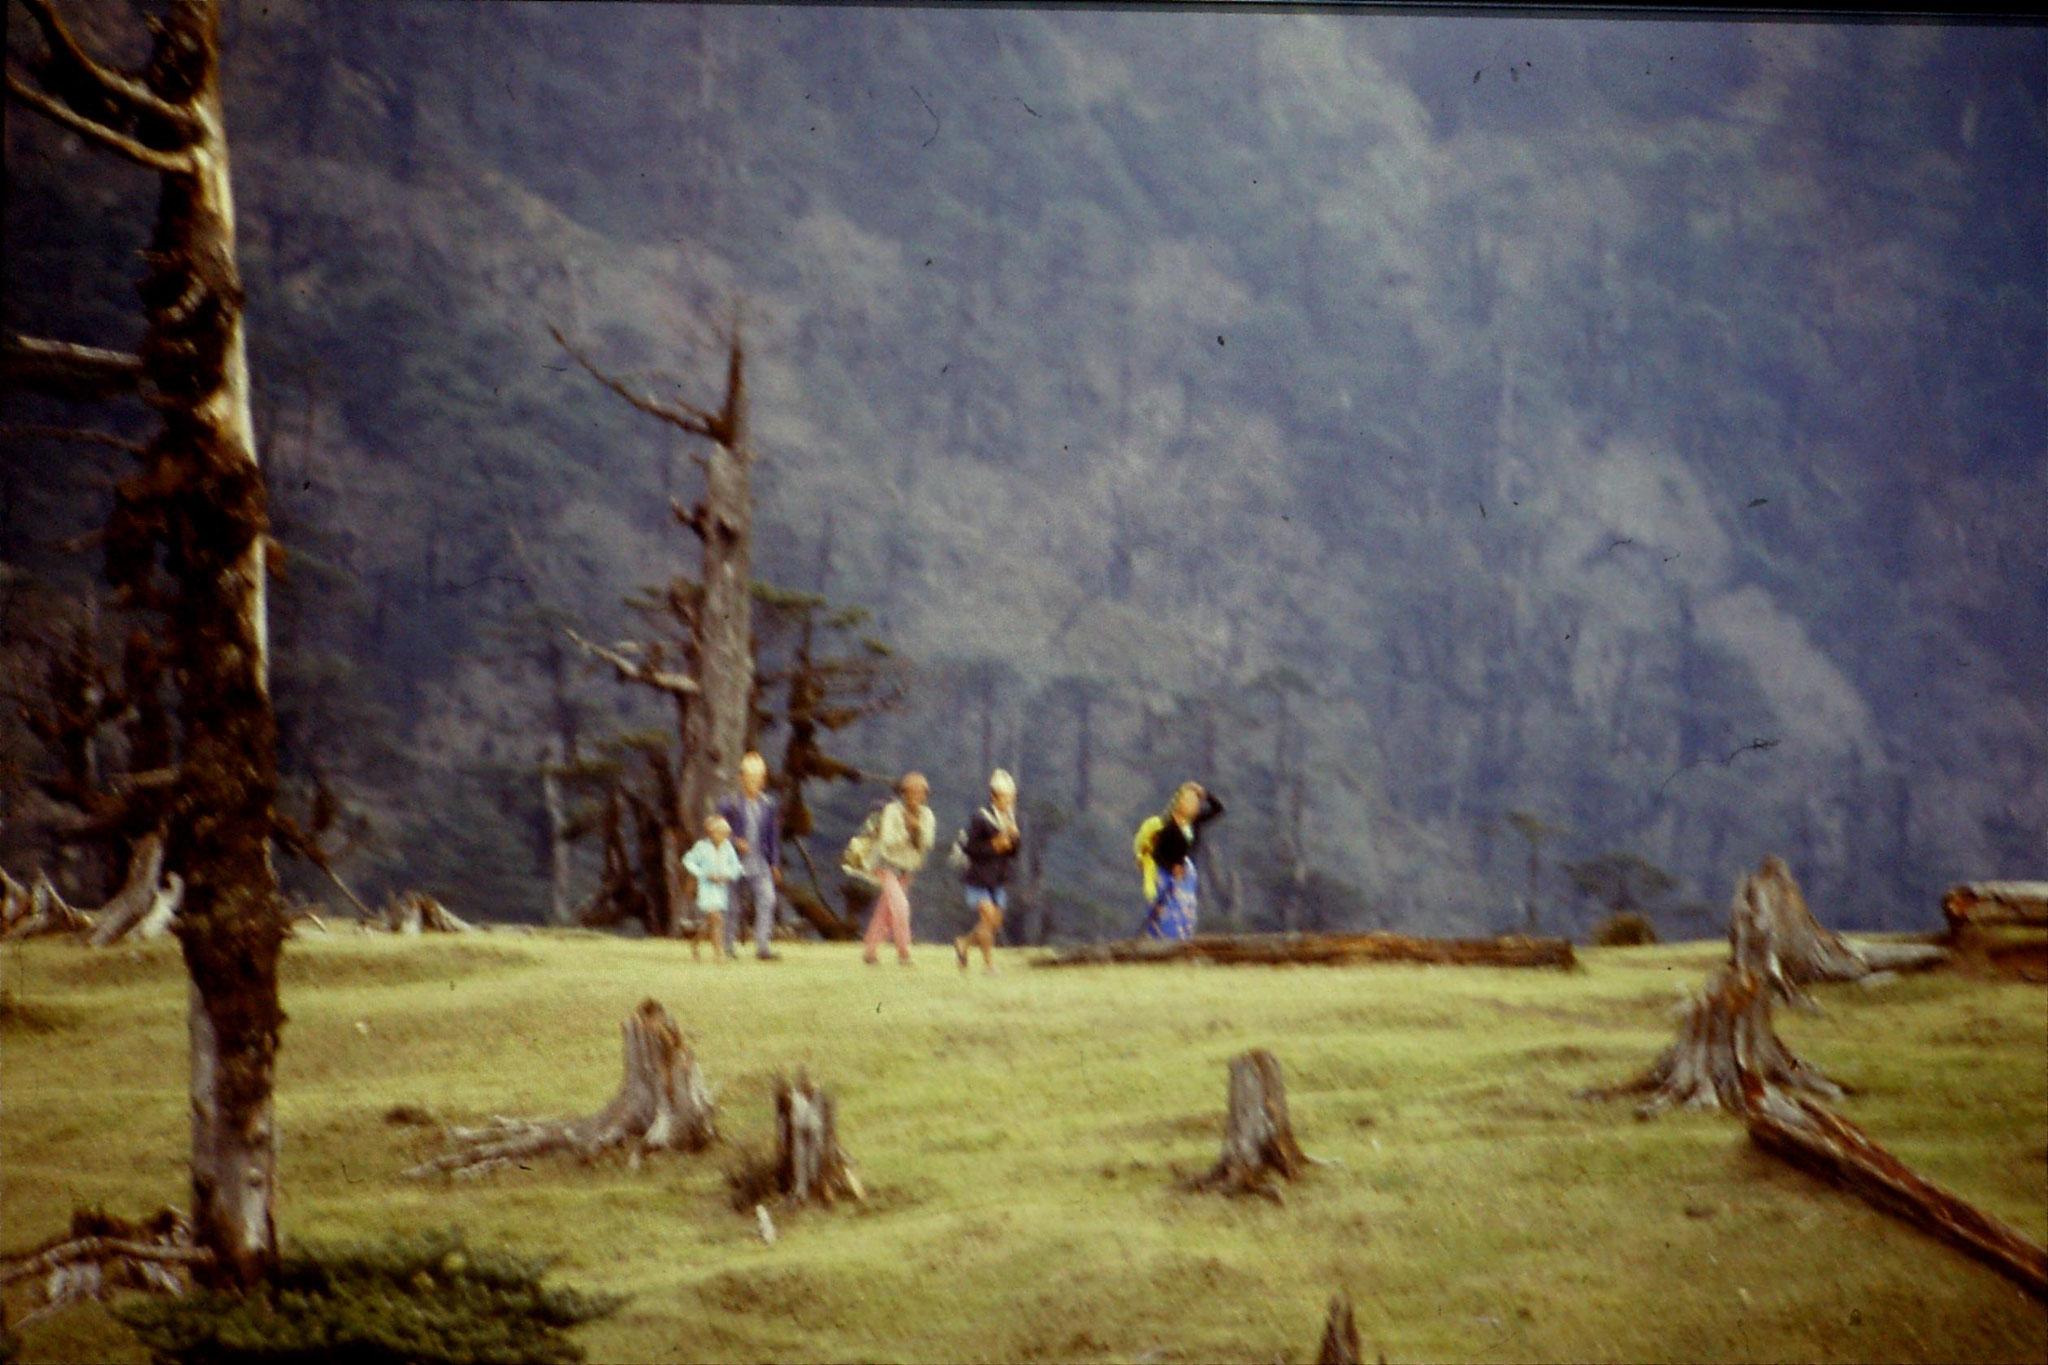 7/5/1990: 19: Nepali family